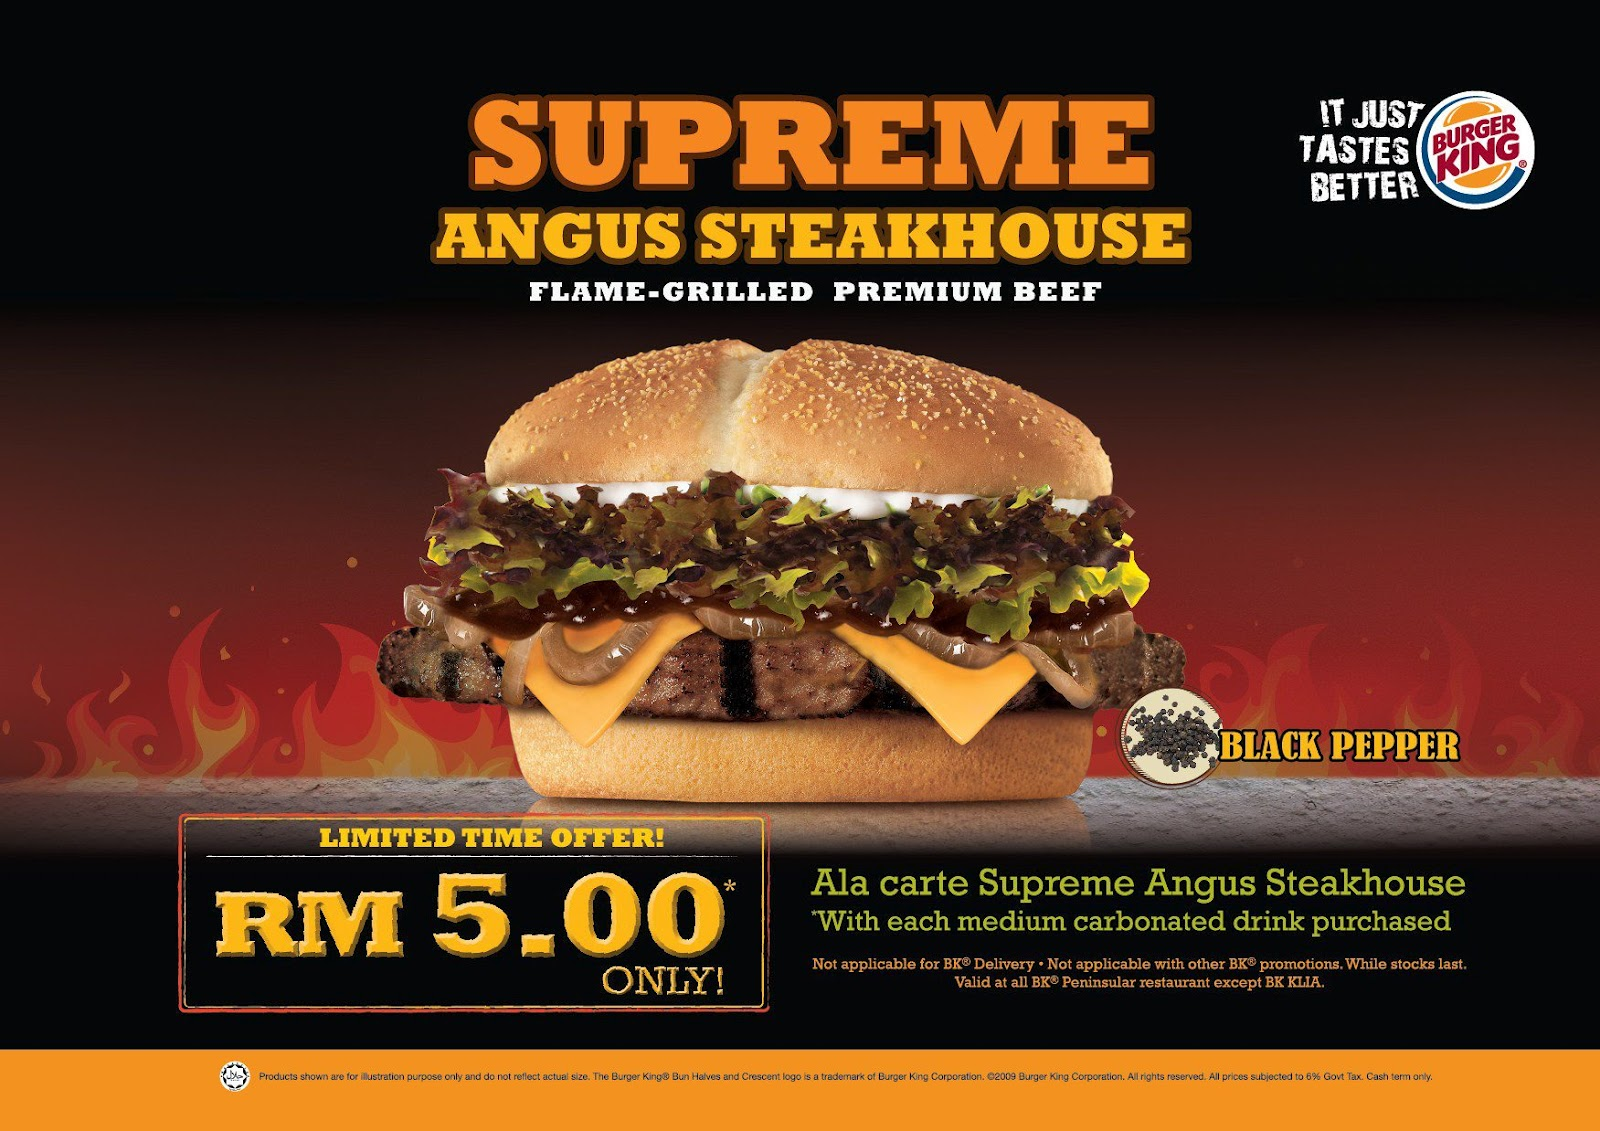 Carte Burger King.Ala Carte Burger King Supreme Angus Steakhouse Black Pepper